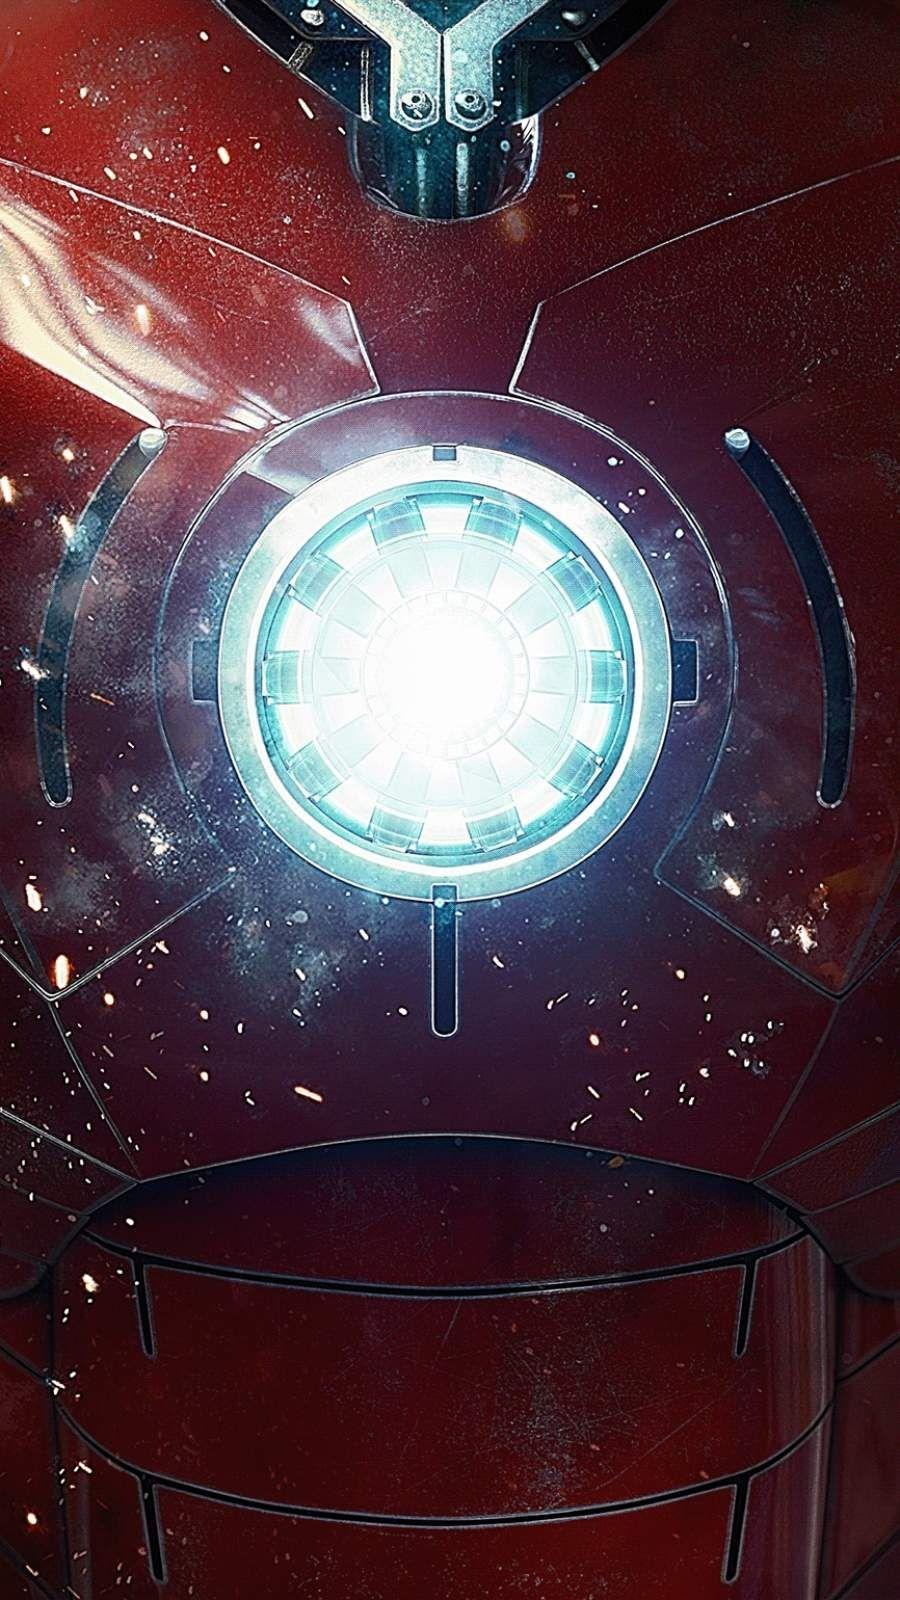 Iron Man Arc Reactor Armor Iphone Wallpaper Iron Man Arc Reactor Iron Man Arc Iron Man Hd Wallpaper